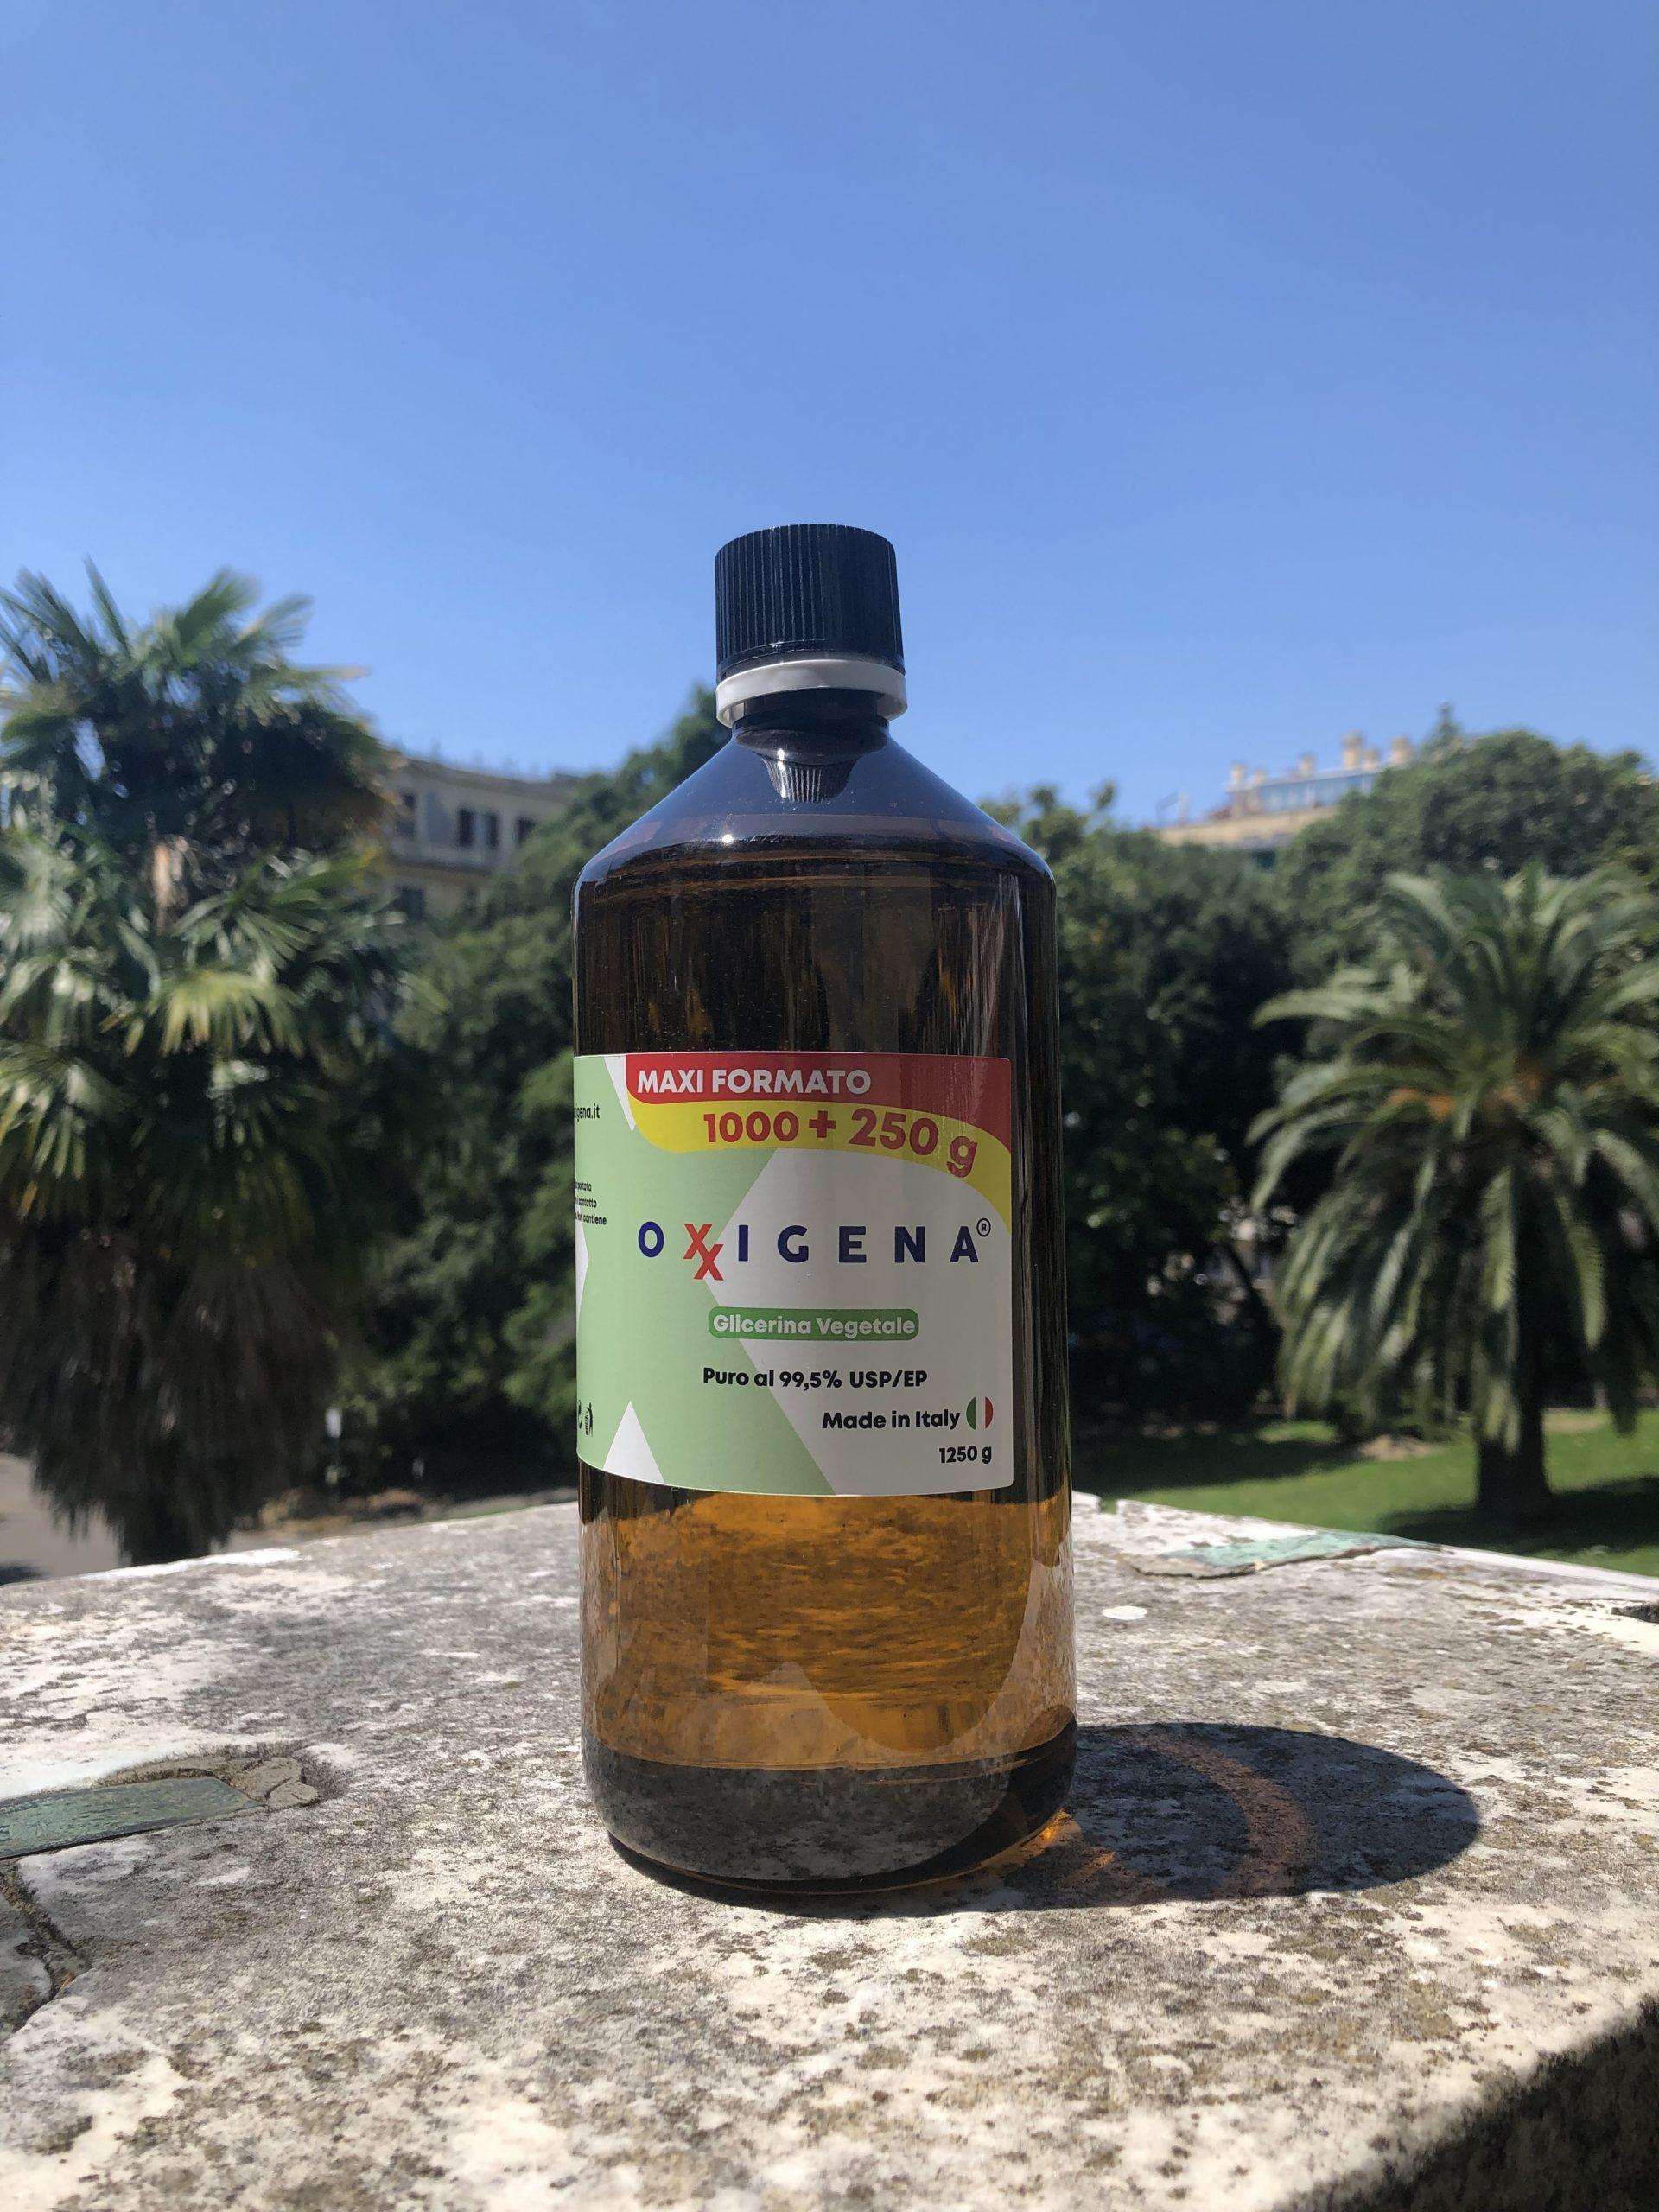 Glicerina Vegetale USP/EP (Glicerolo) – 1L (1000g + 250g)